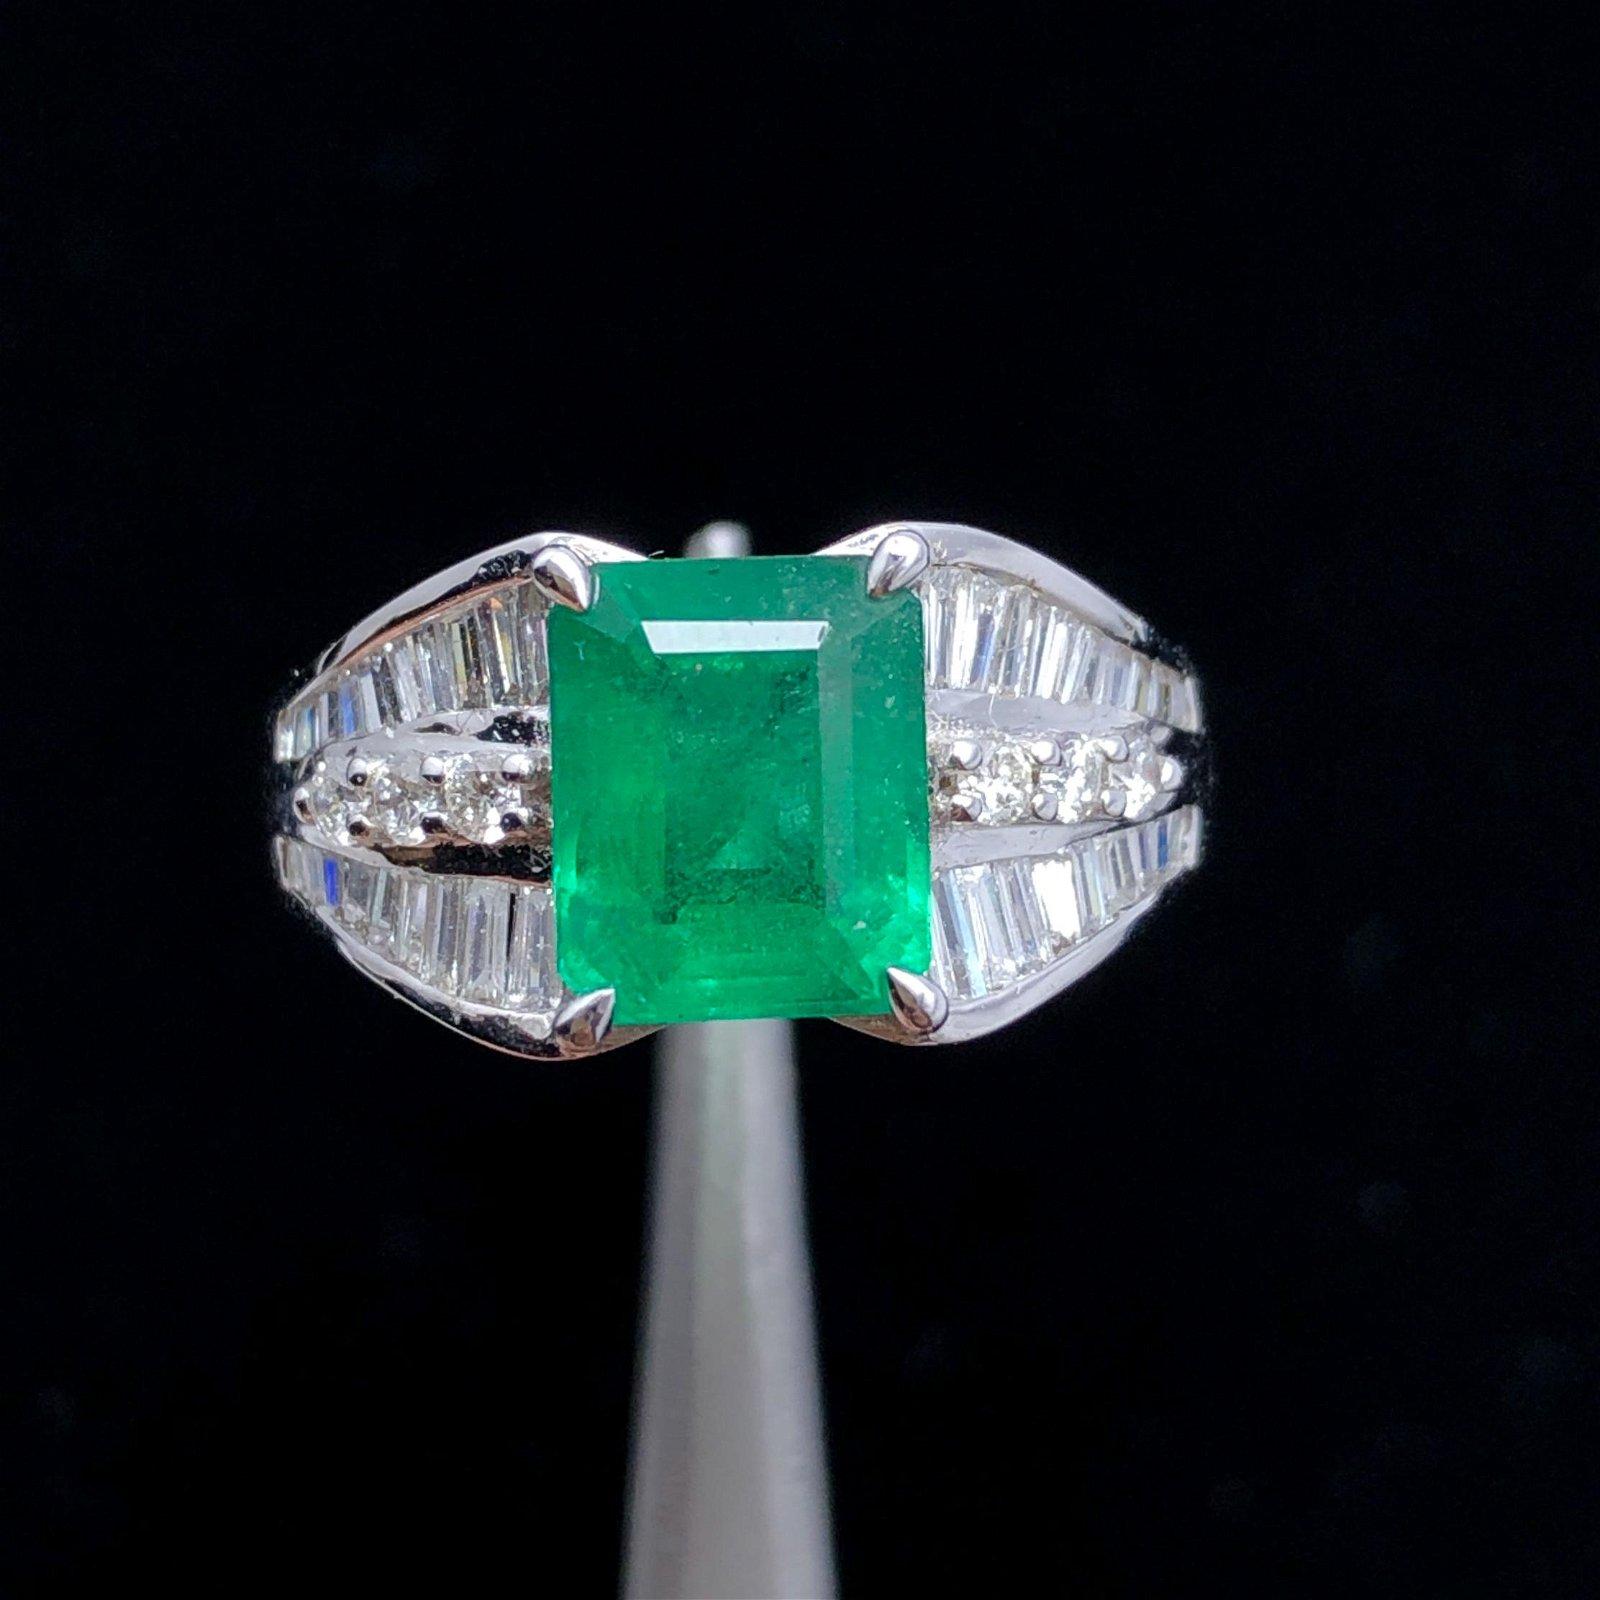 18k Gold Emerald Ring - Diamond